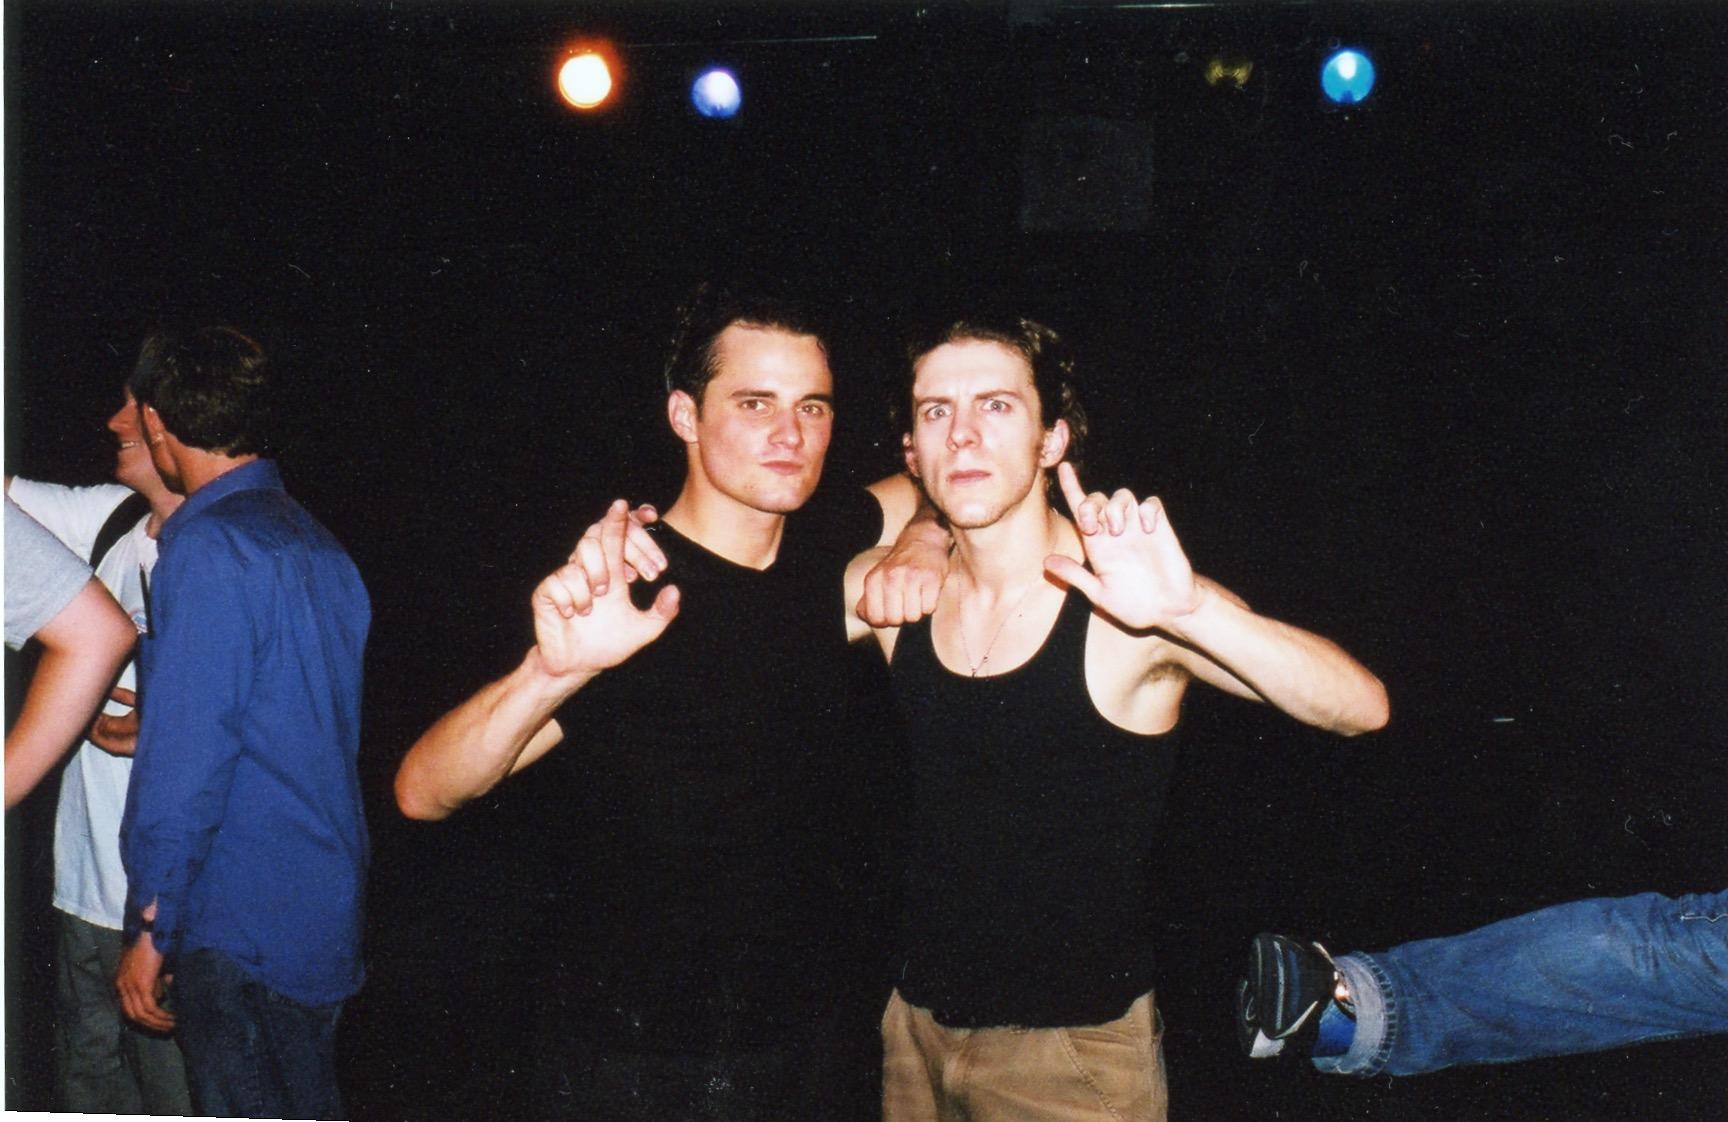 Charlie Cutler and Mark Hackman September 2002 (Photo by Garry Cutler)